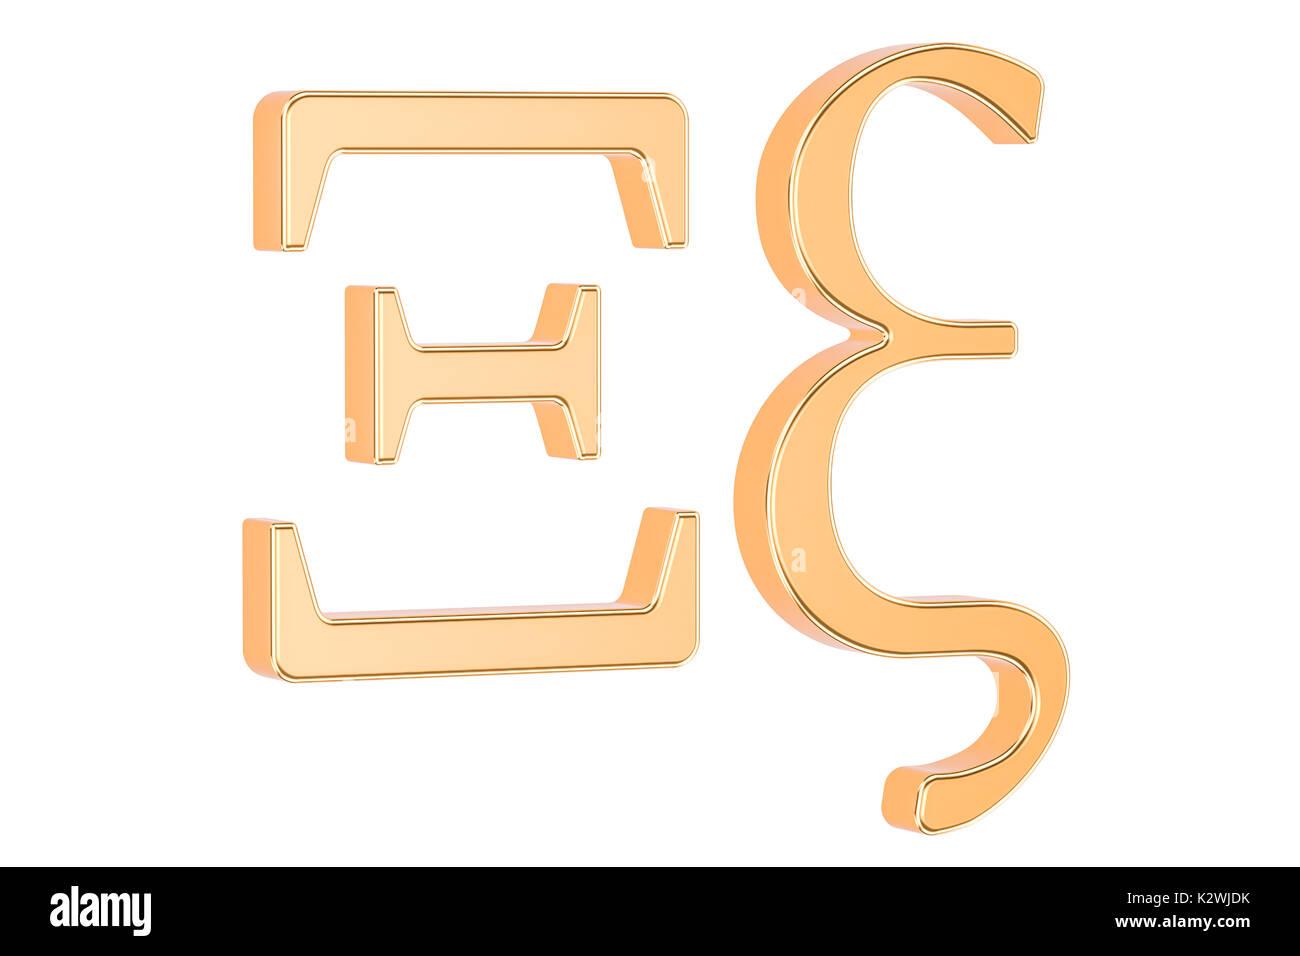 golden greek letter xi 3d rendering isolated on white background